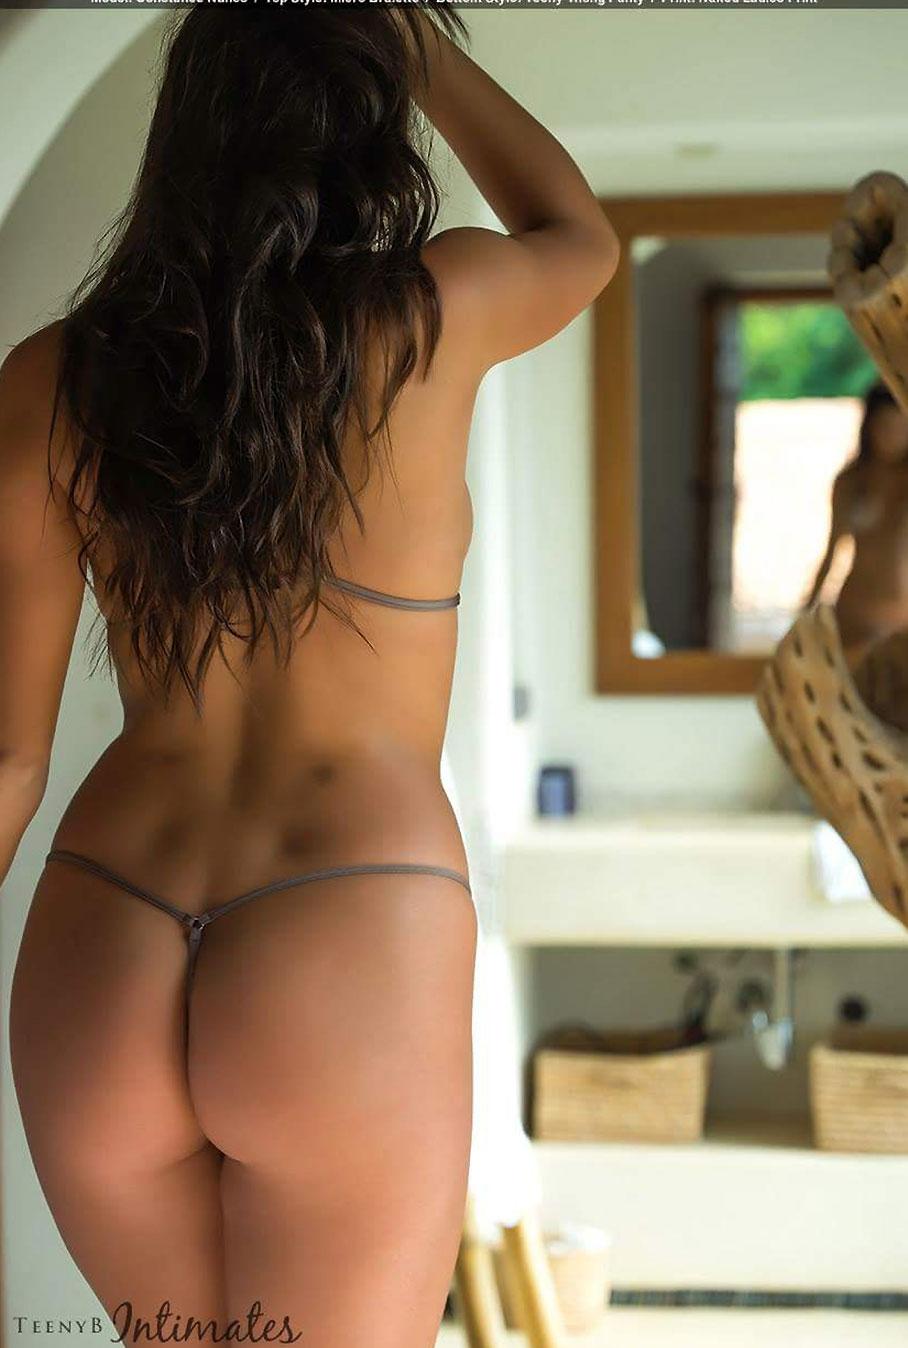 Constance Nunes nude ass